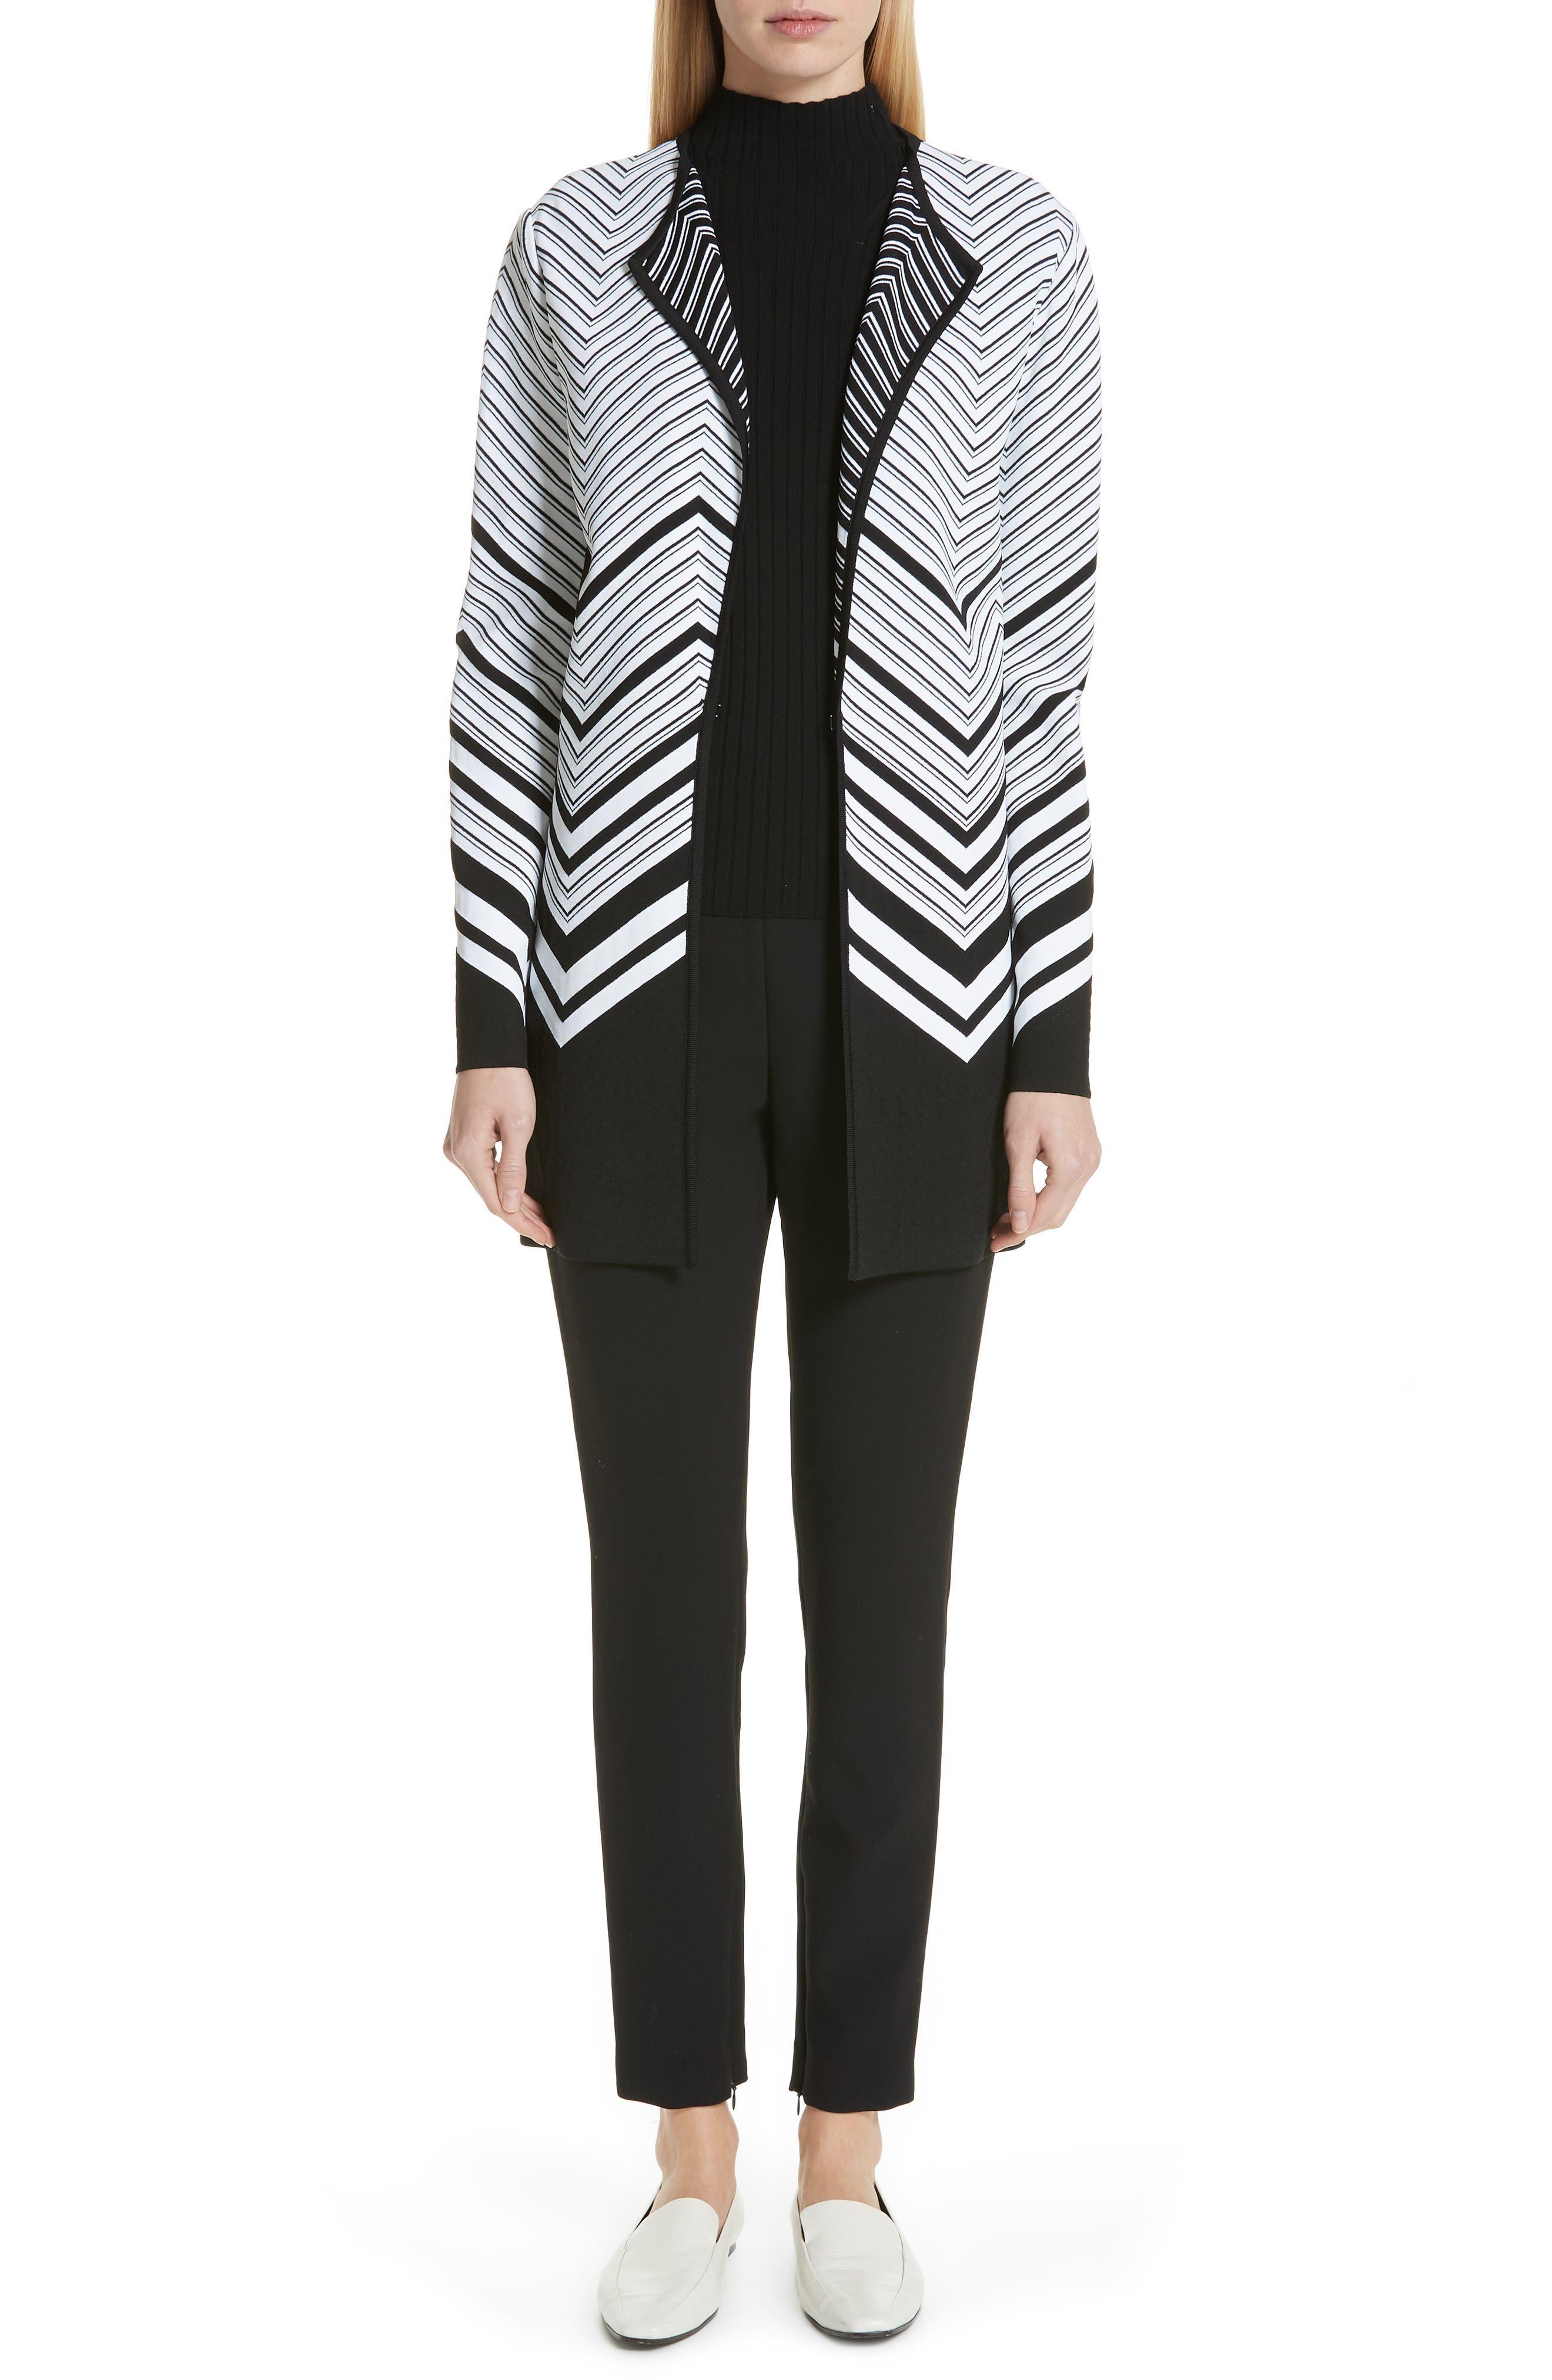 ST. JOHN COLLECTION, Flat Rib Knit Mock Neck Sweater, Alternate thumbnail 6, color, CAVIAR